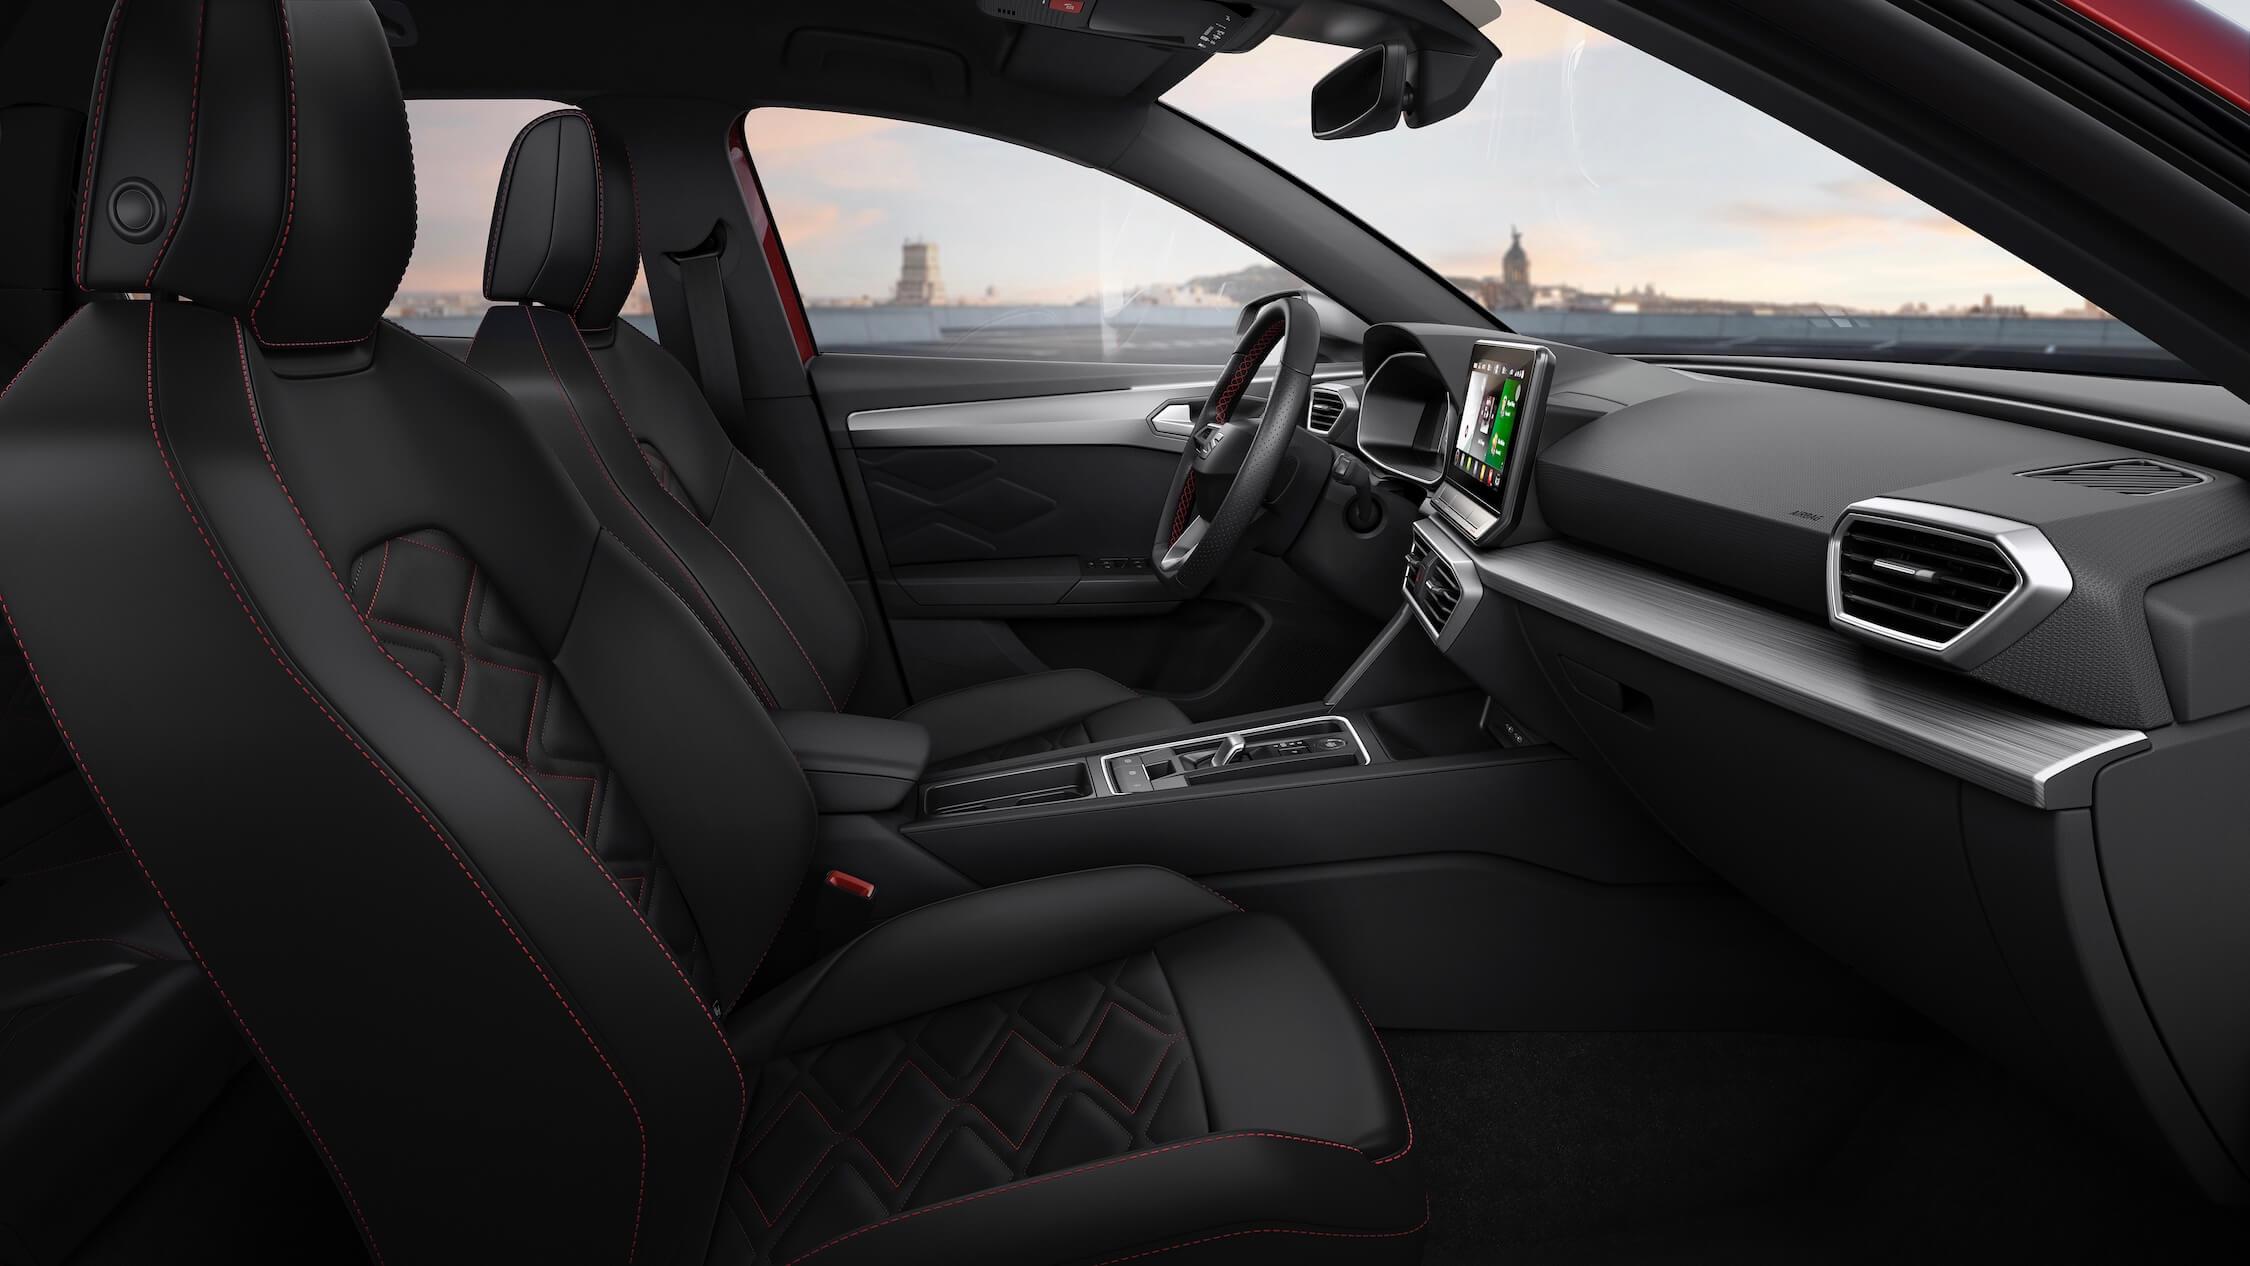 Nieuwe Seat Leon hybride interieur